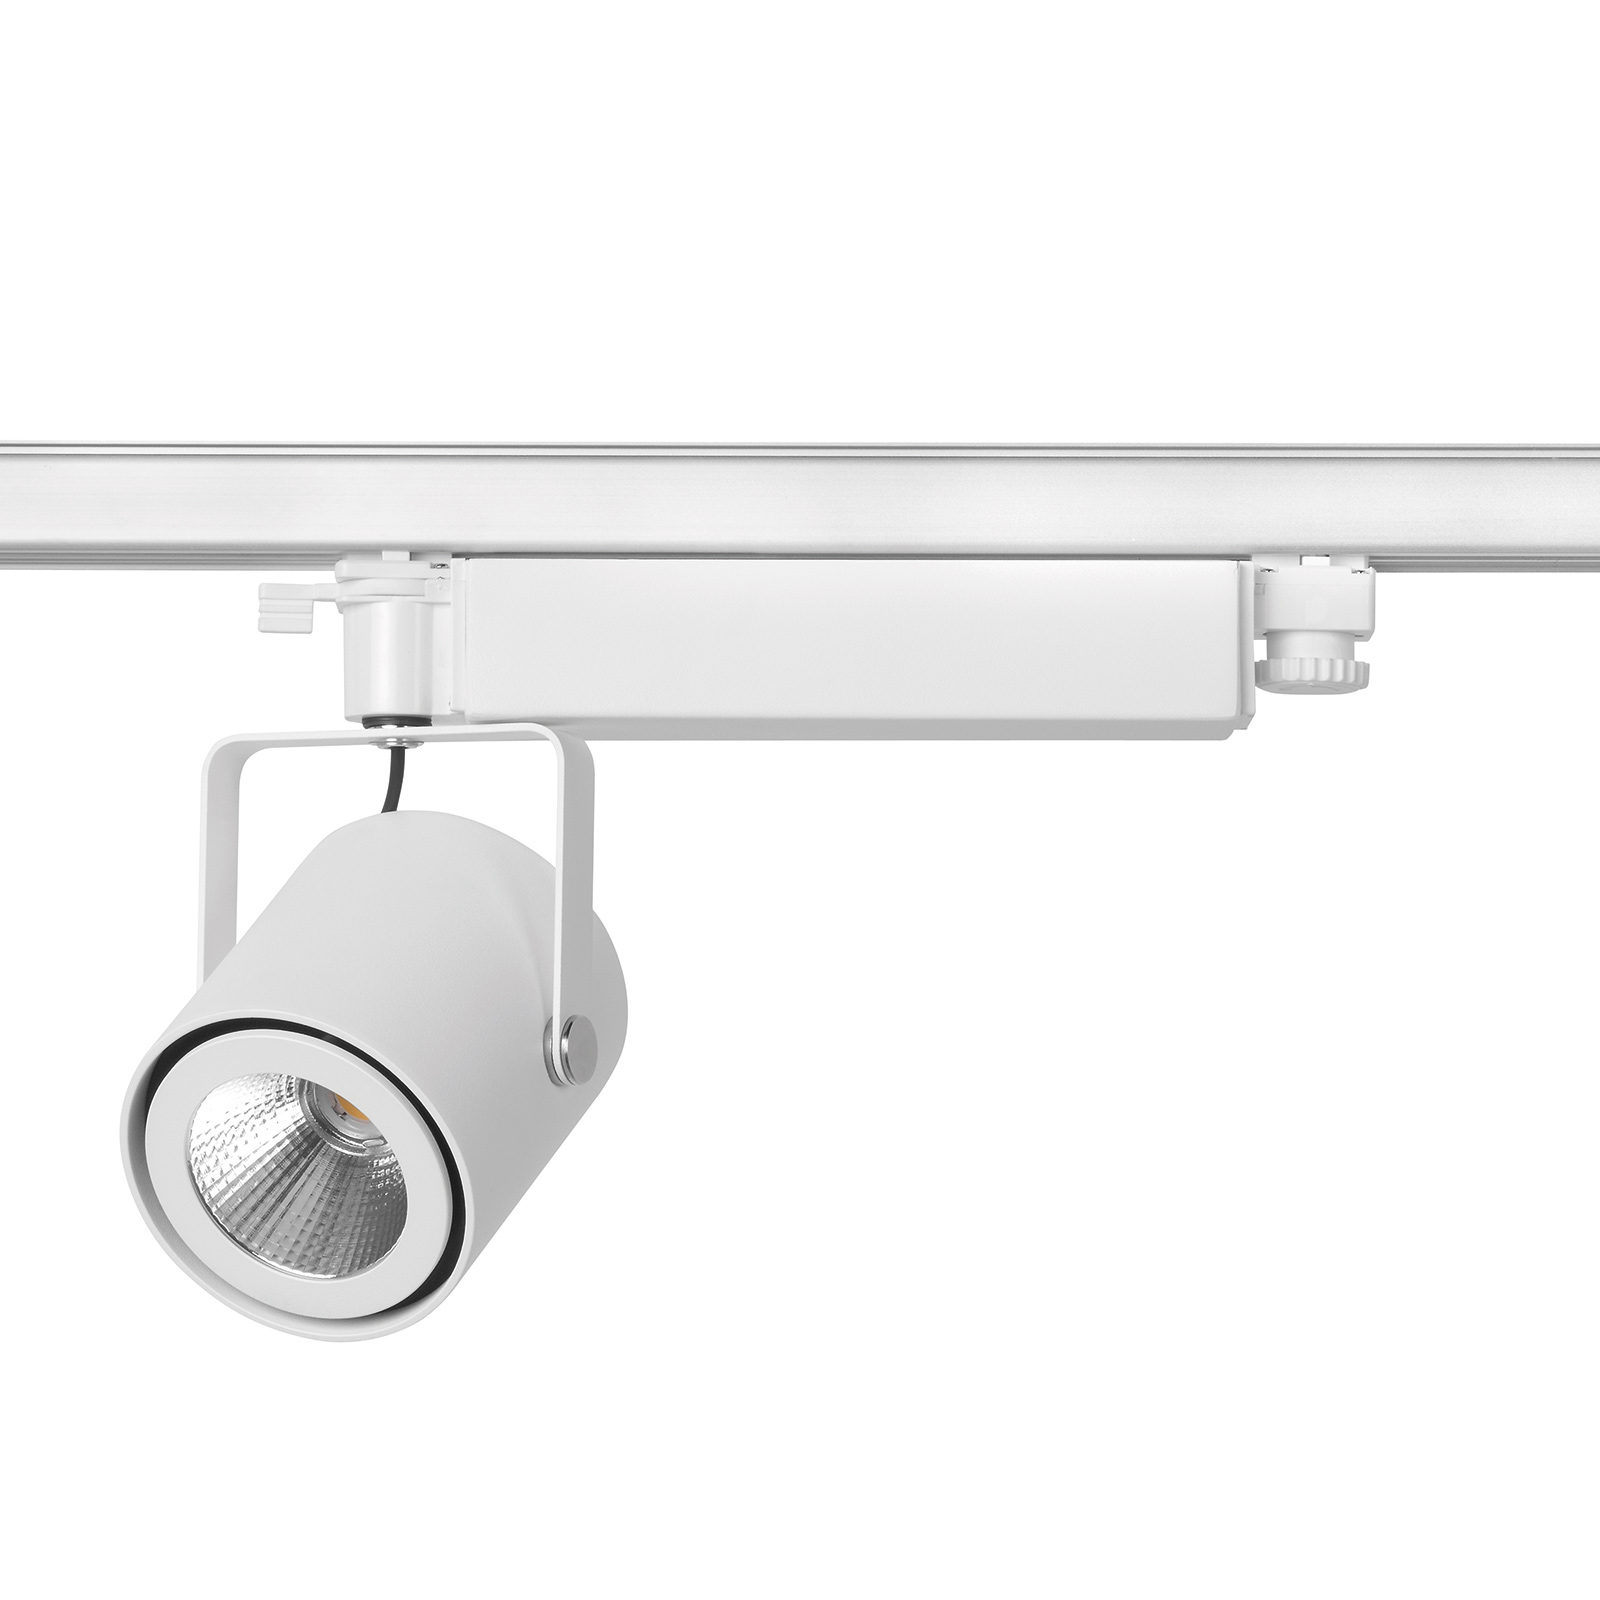 Flexibler LED-Schienenstrahler Avior Surfaced